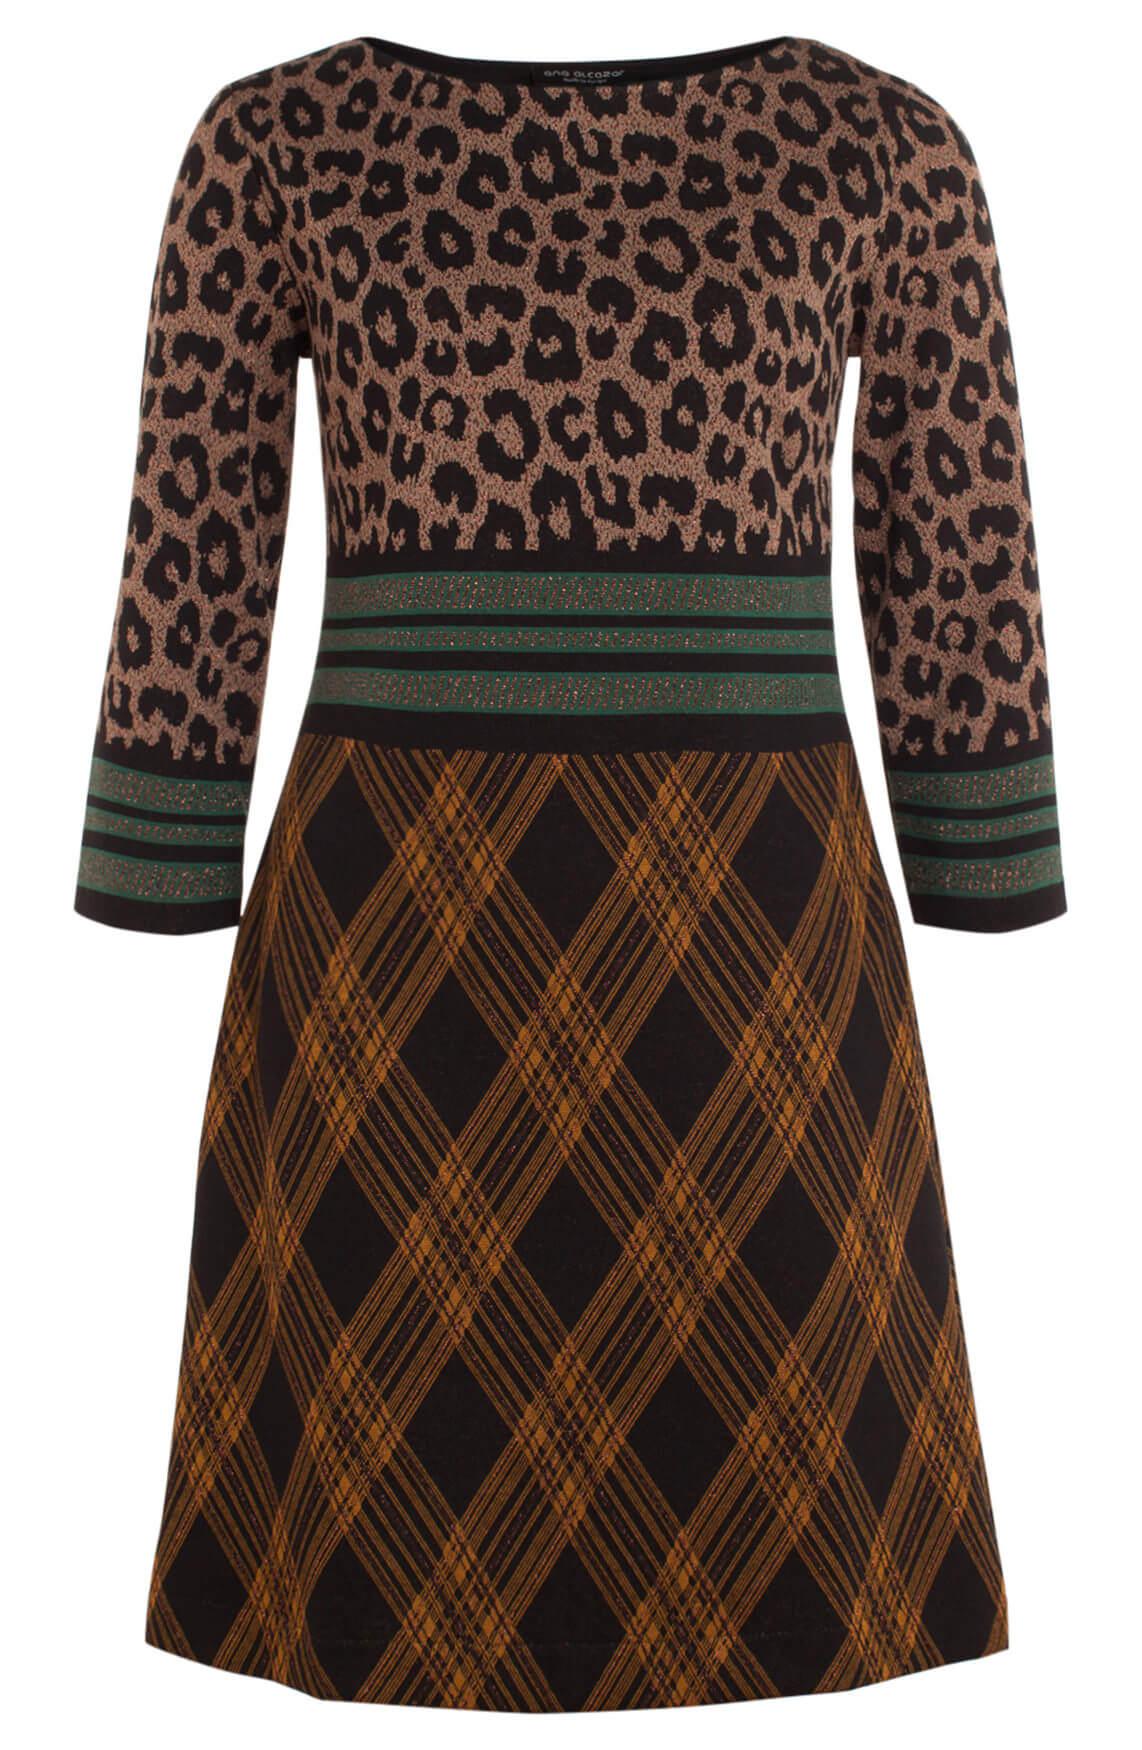 890aae4ed95be2 Ana Alcazar Dames Geprinte jurk met lurex zwart